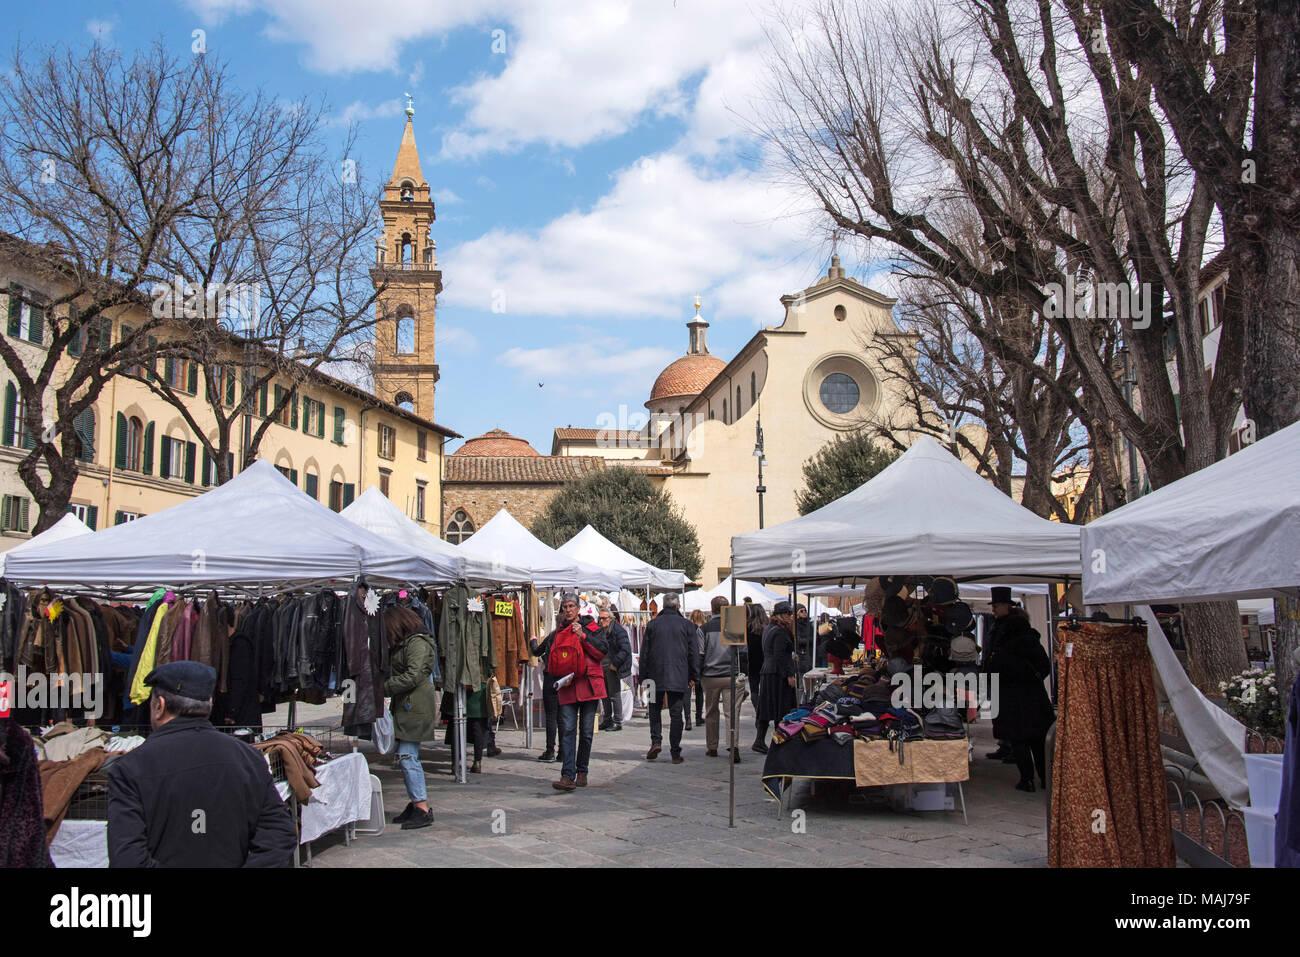 Piazza Santo Spirito Florence Italy. - Stock Image